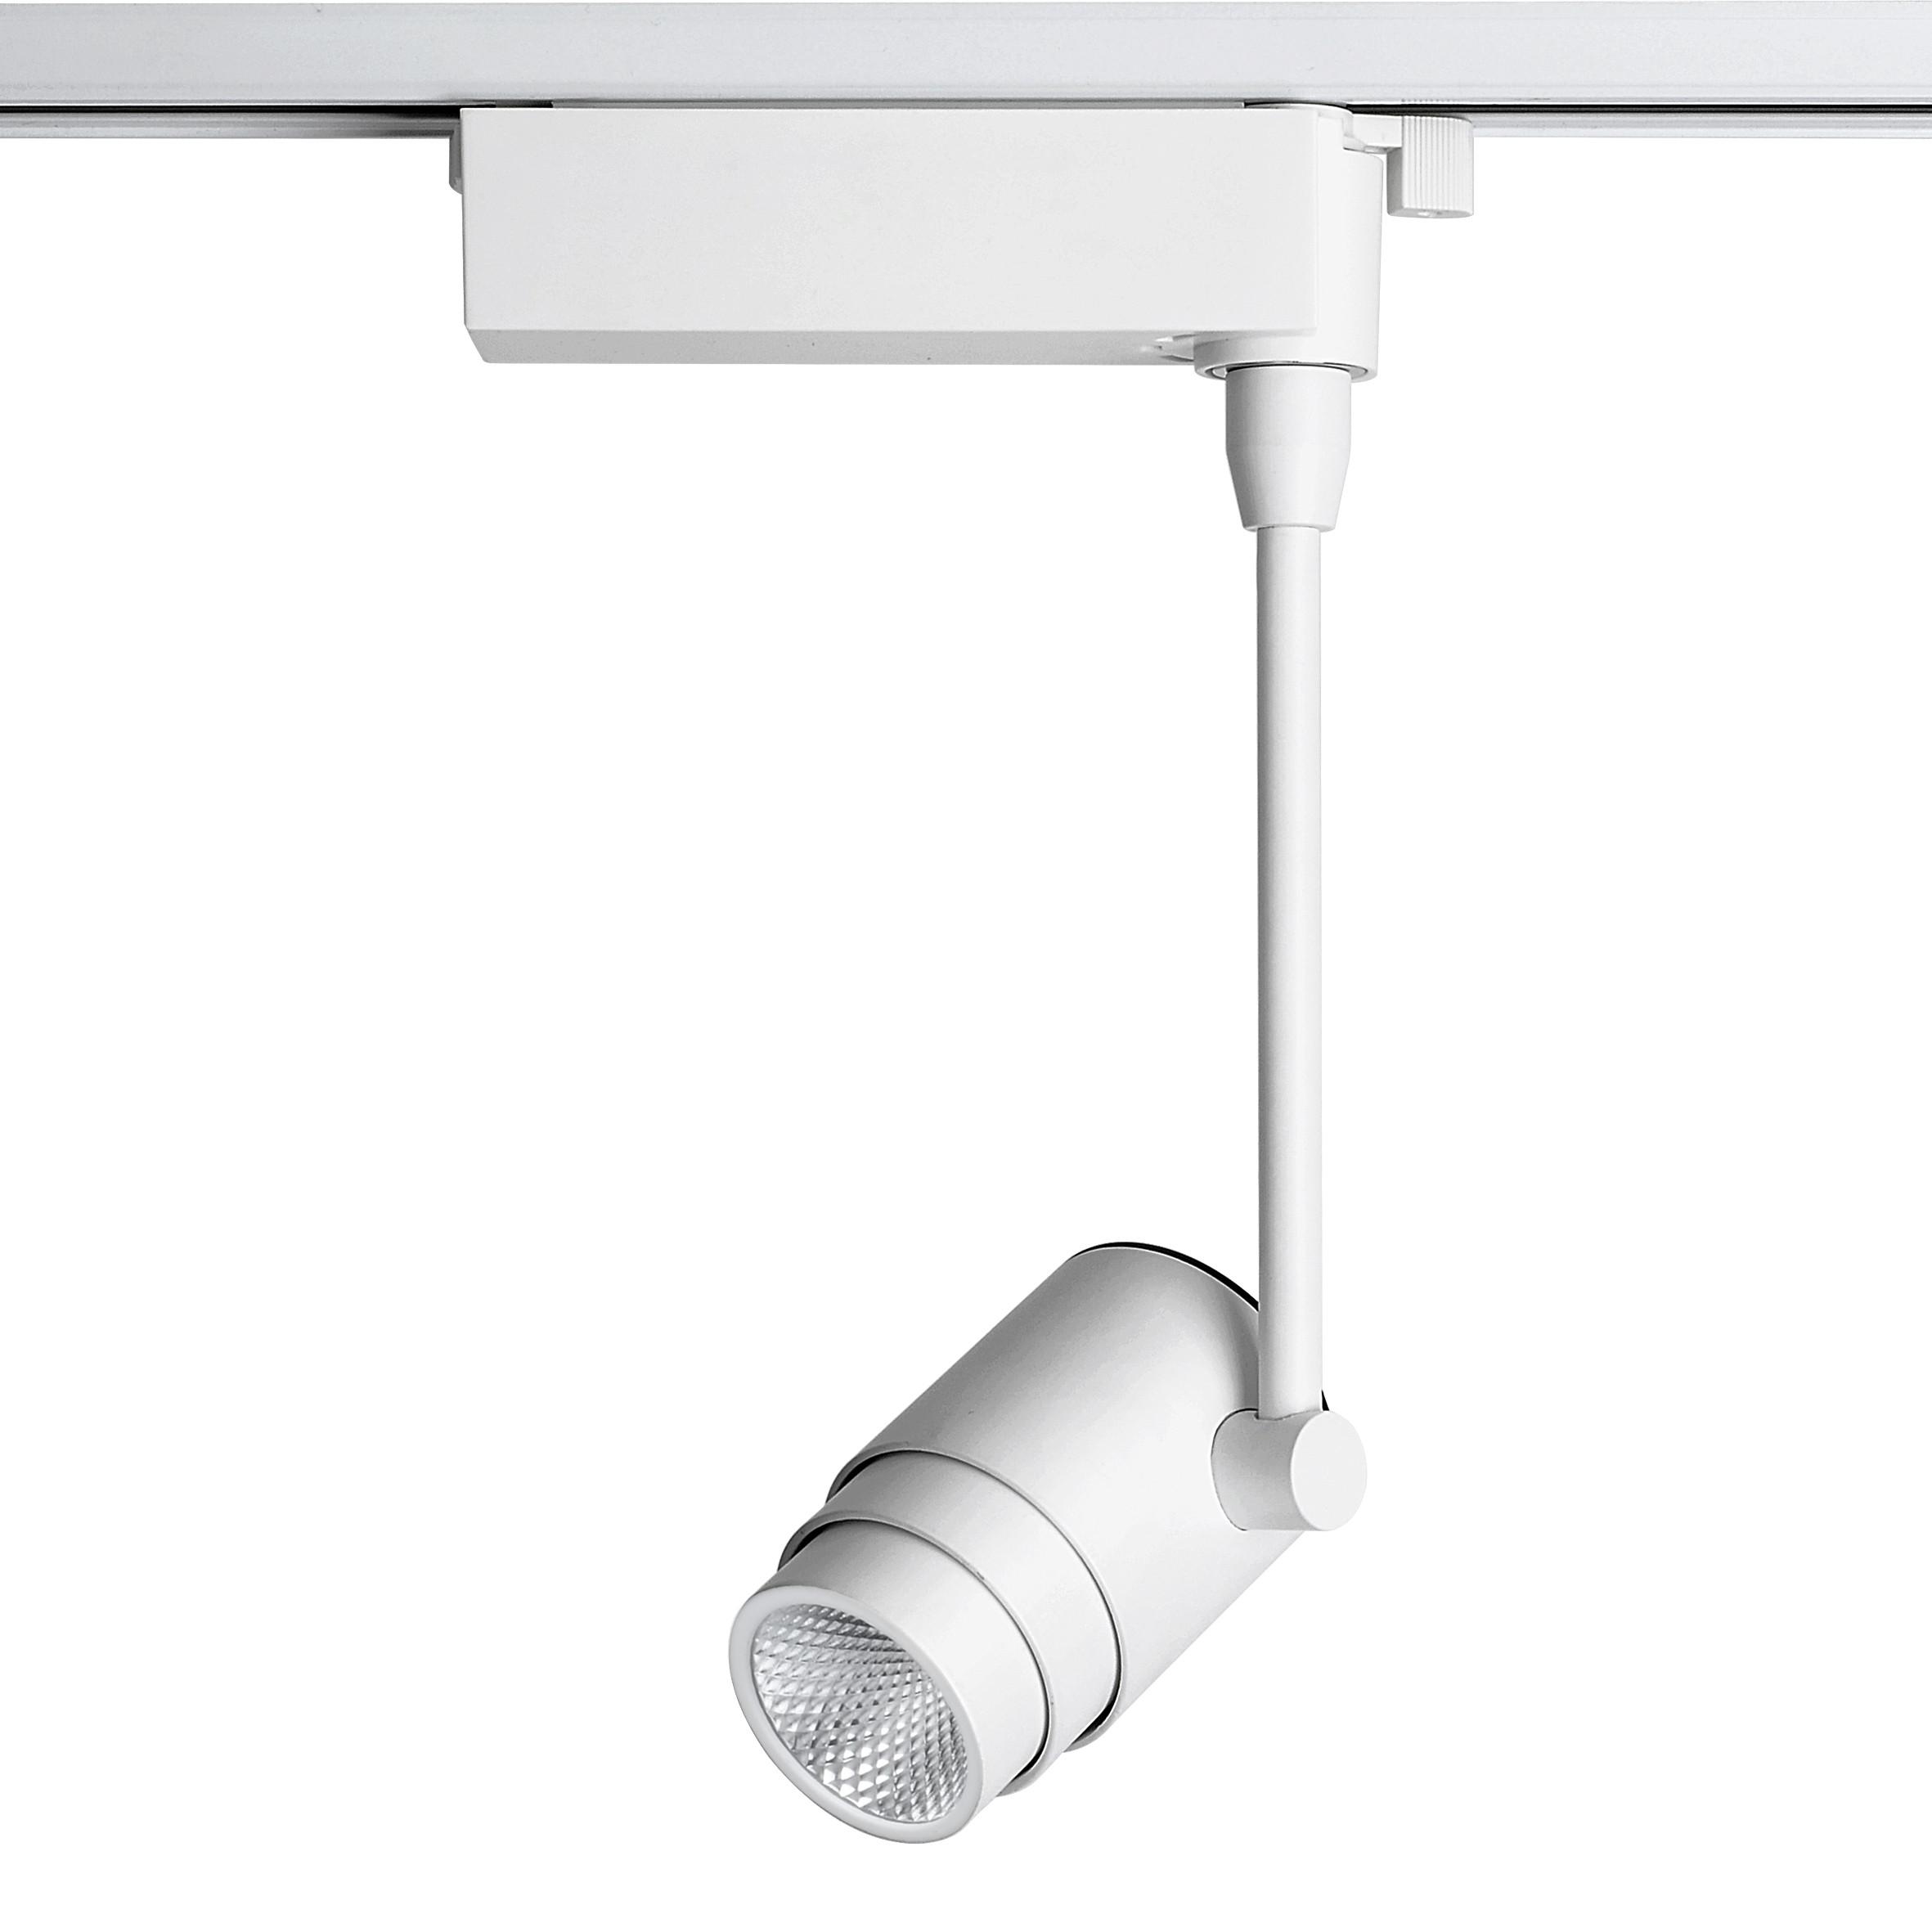 lite remote lighting com rite track kits light amazon led with dp